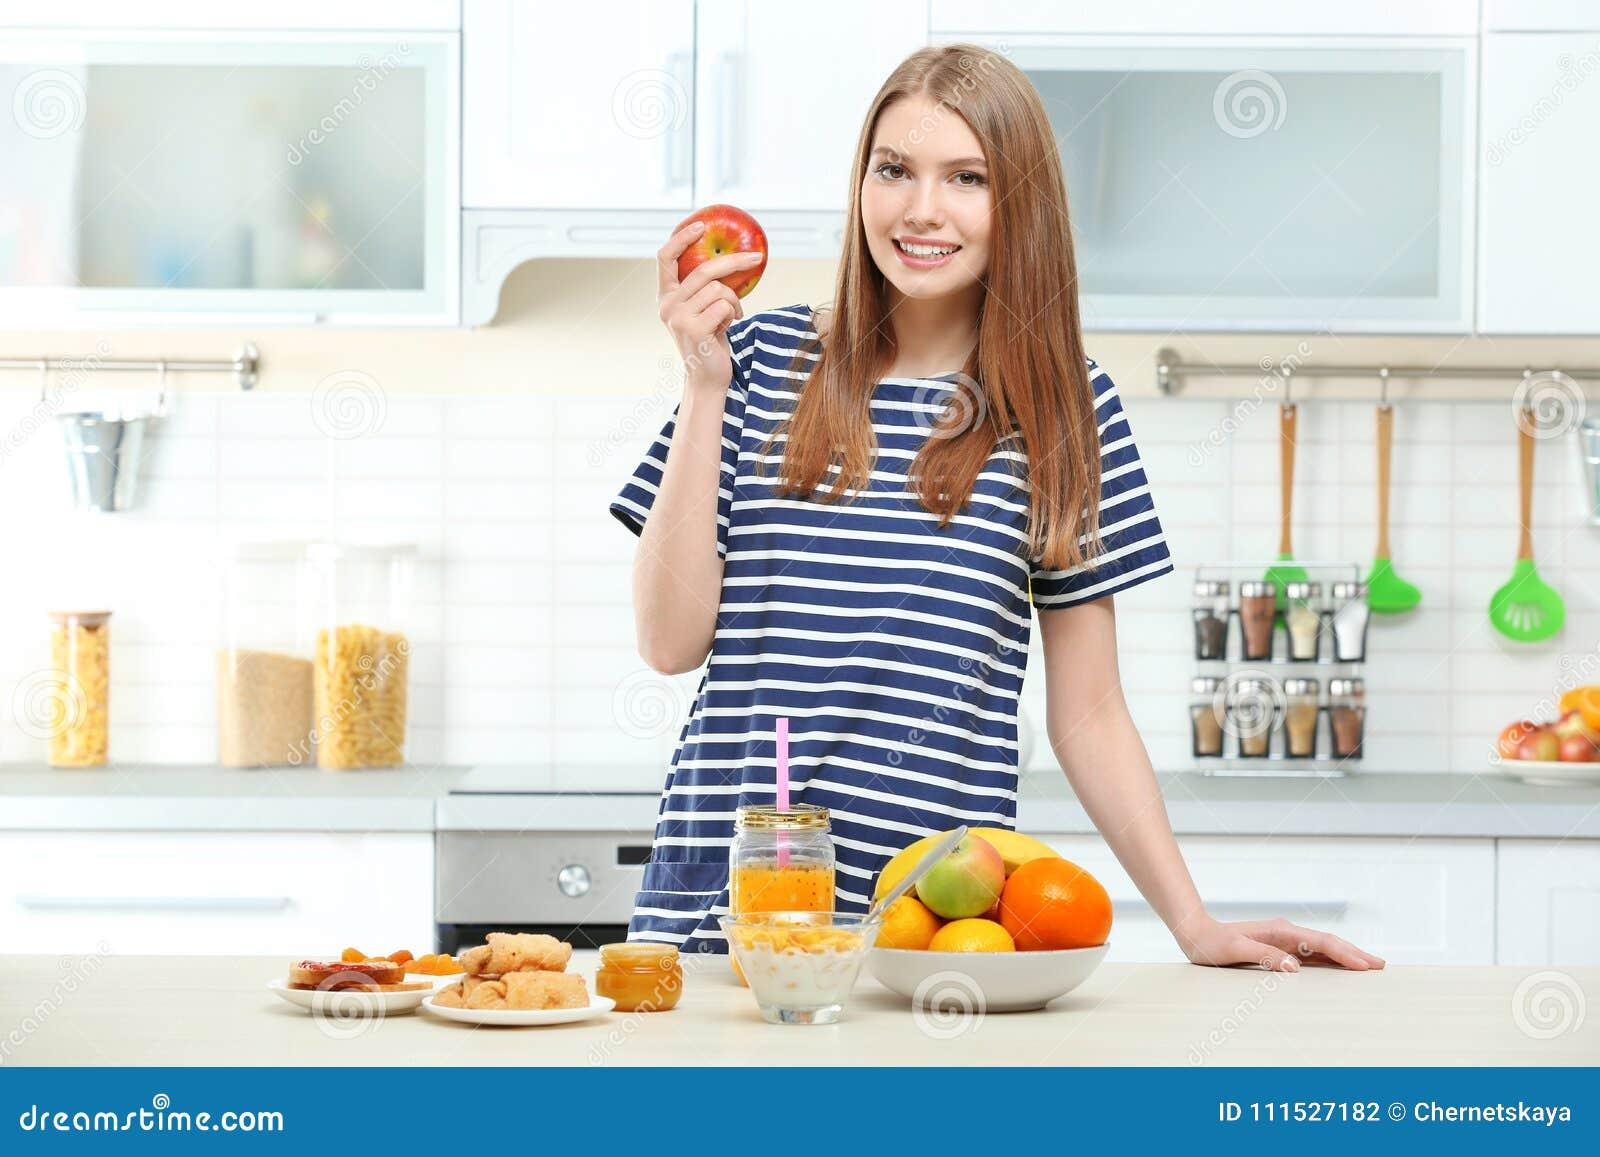 Young beautiful woman having breakfast